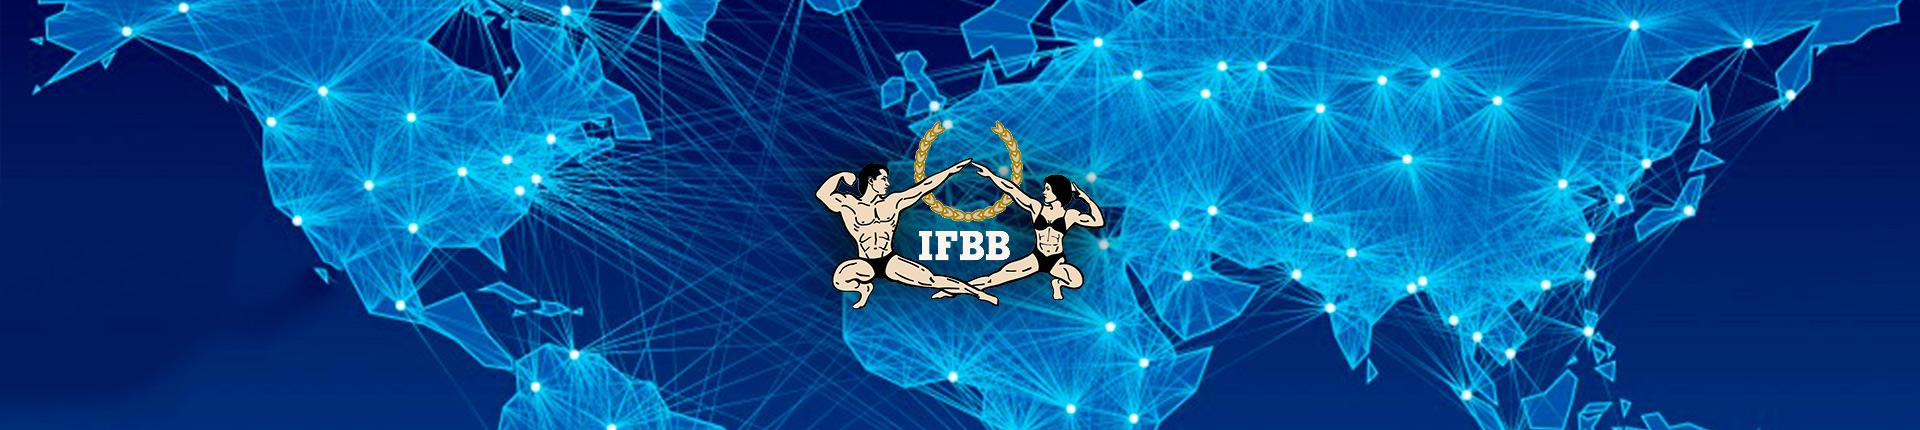 Puchar Świata IFBB Rumunia 2018